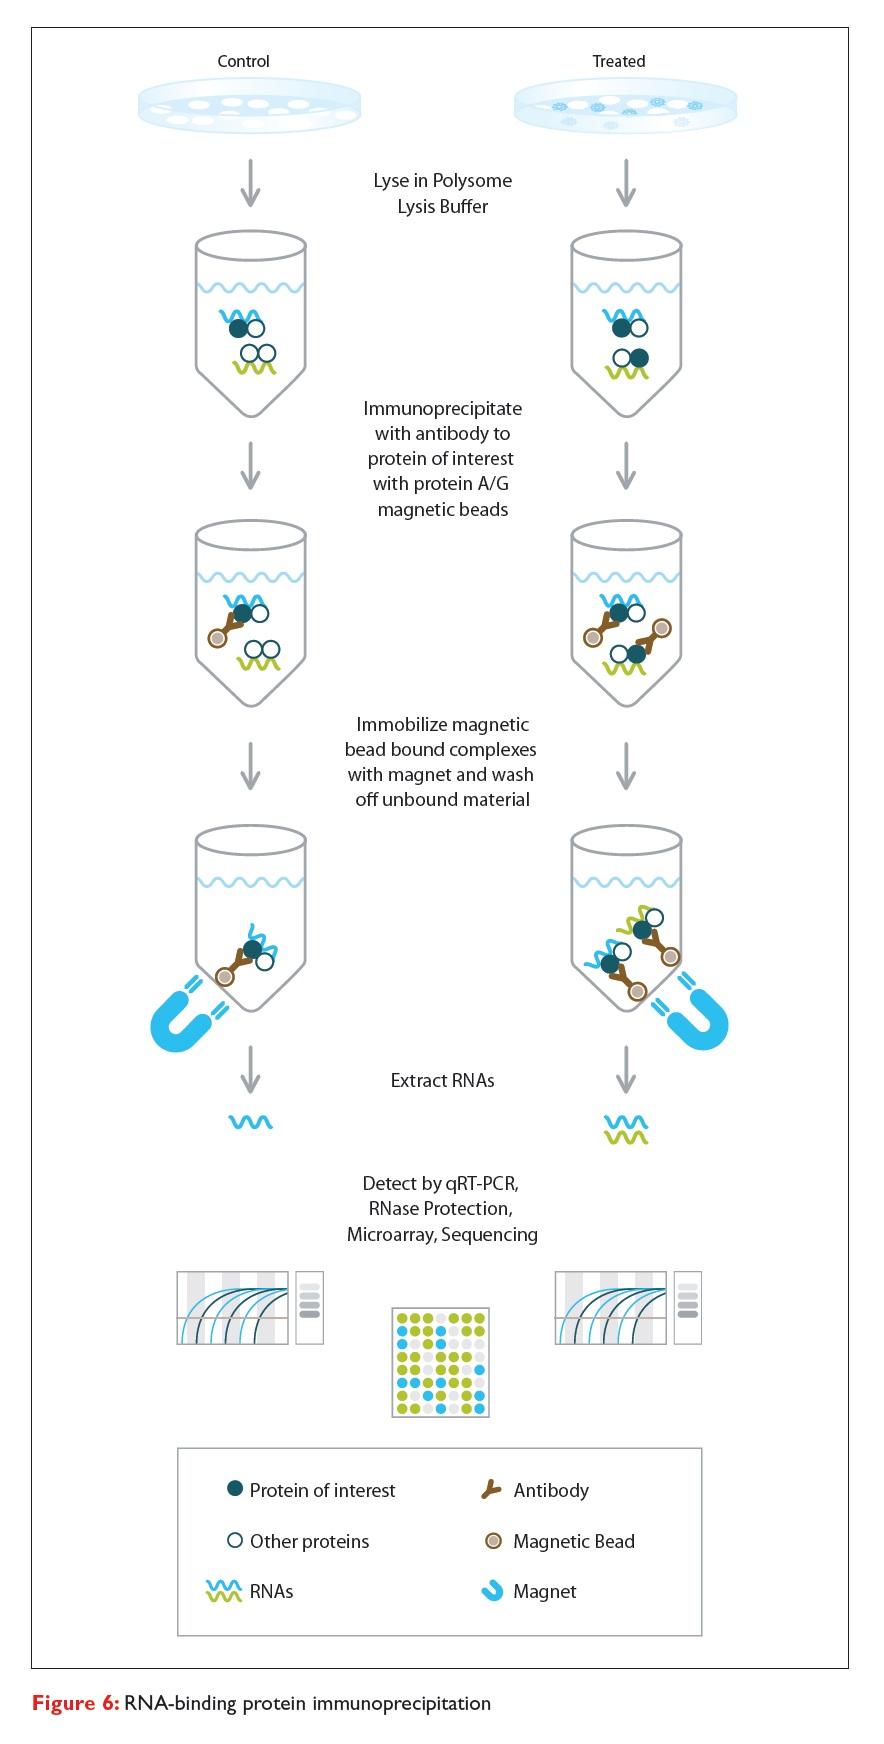 Figure 6 RNA-binding protein immunoprecipitation